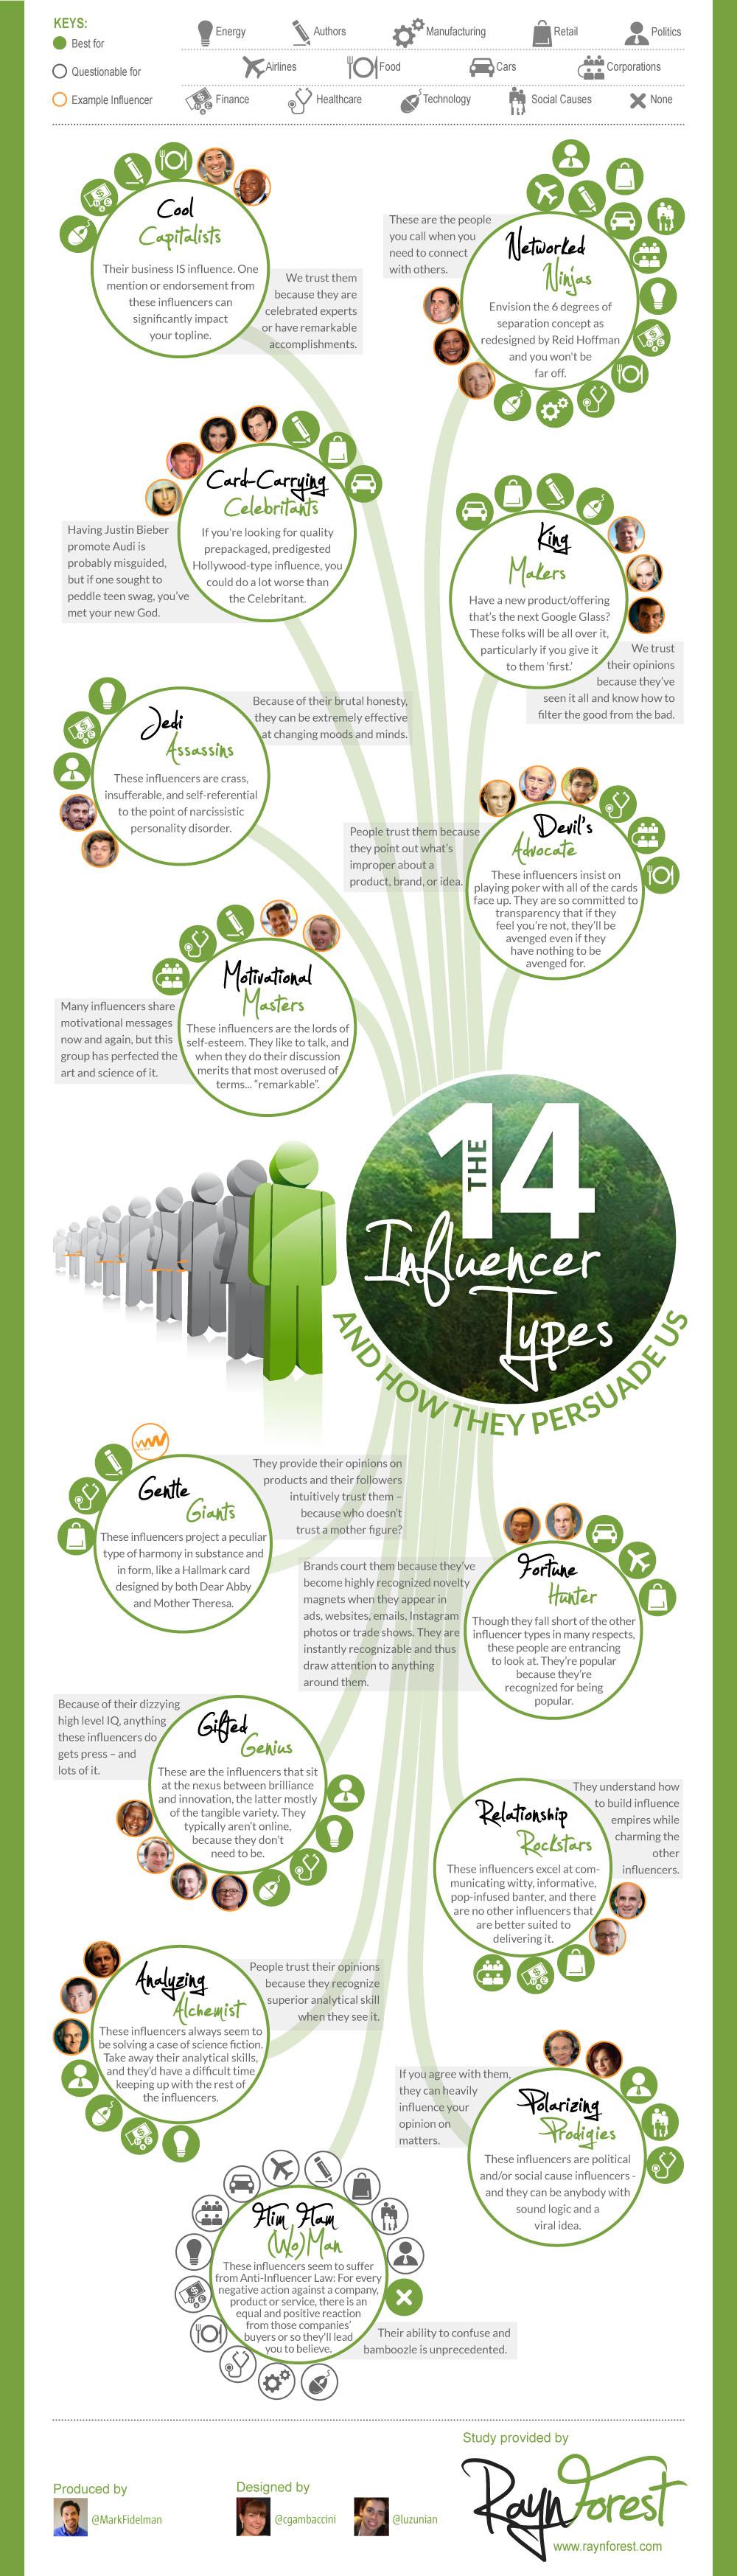 20130730-Influencers-Categories